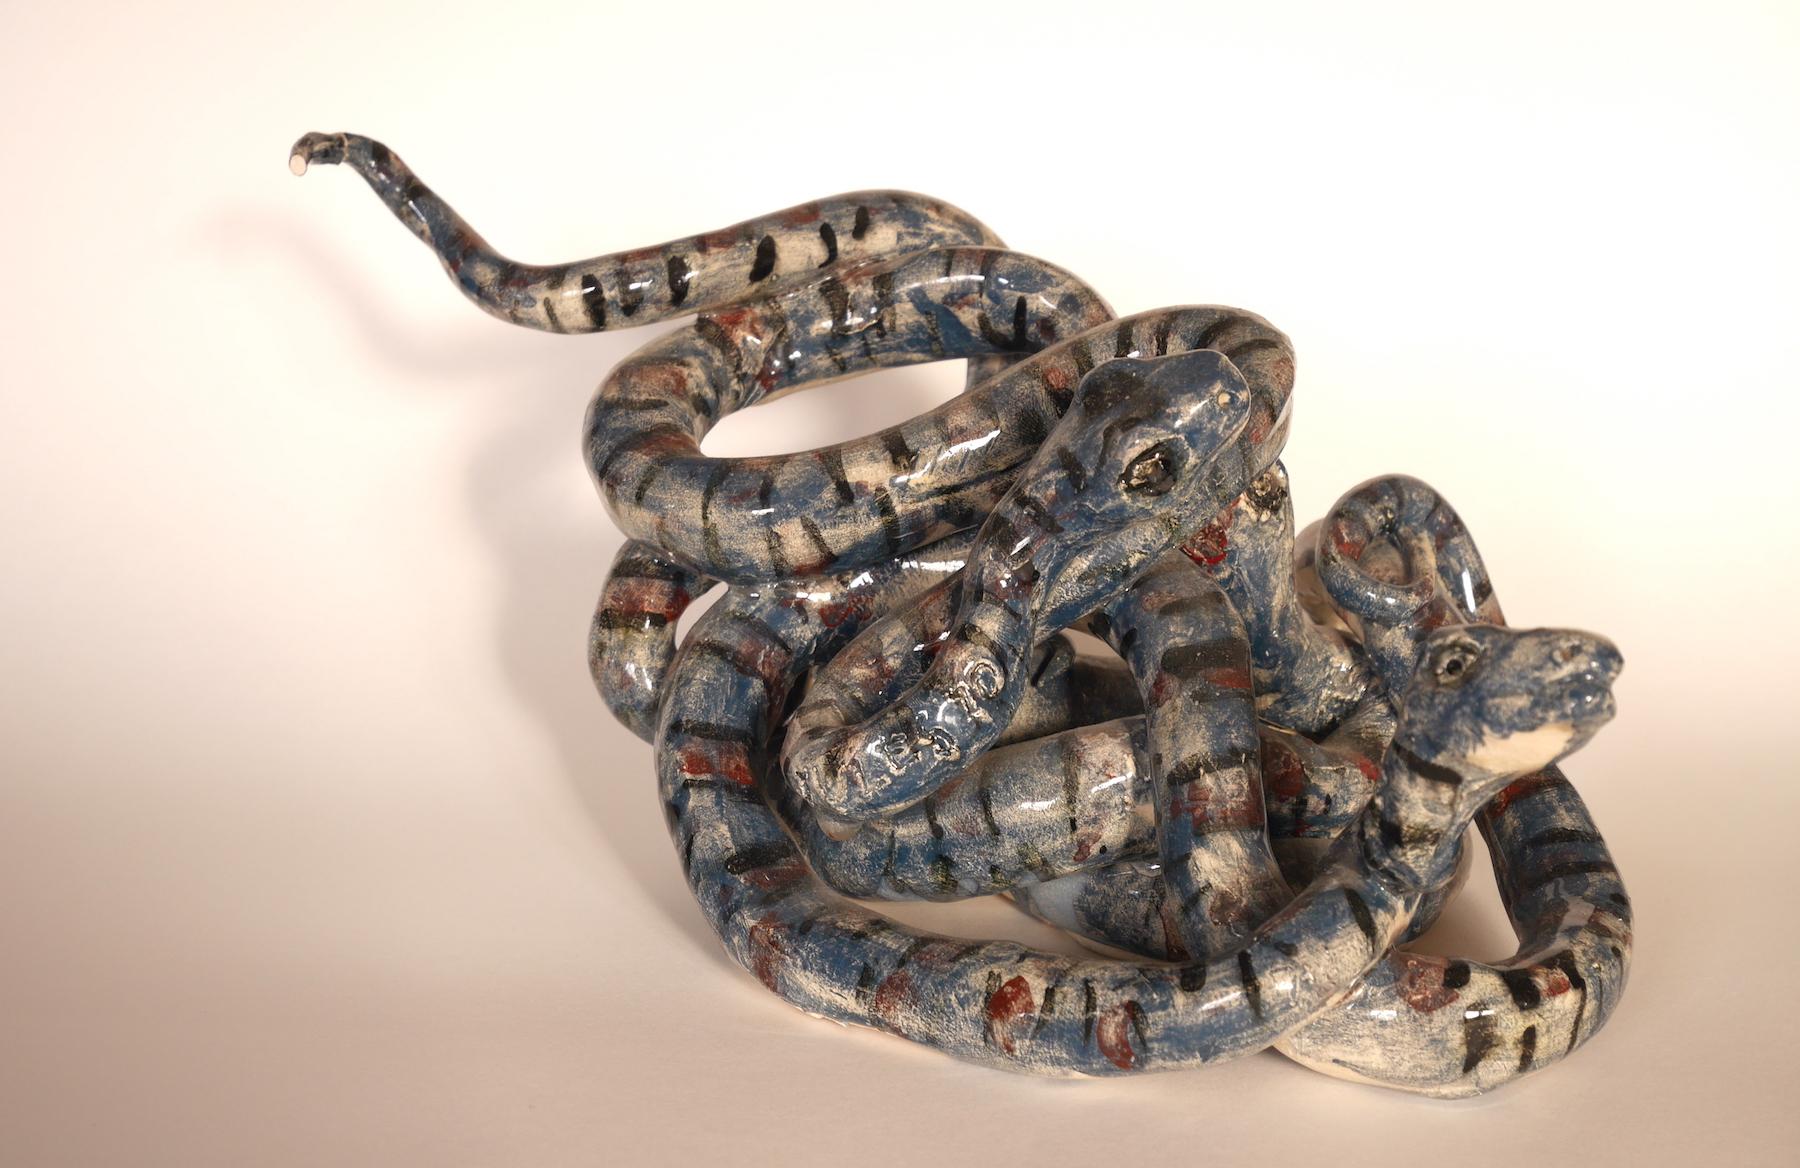 Noeud de serpents